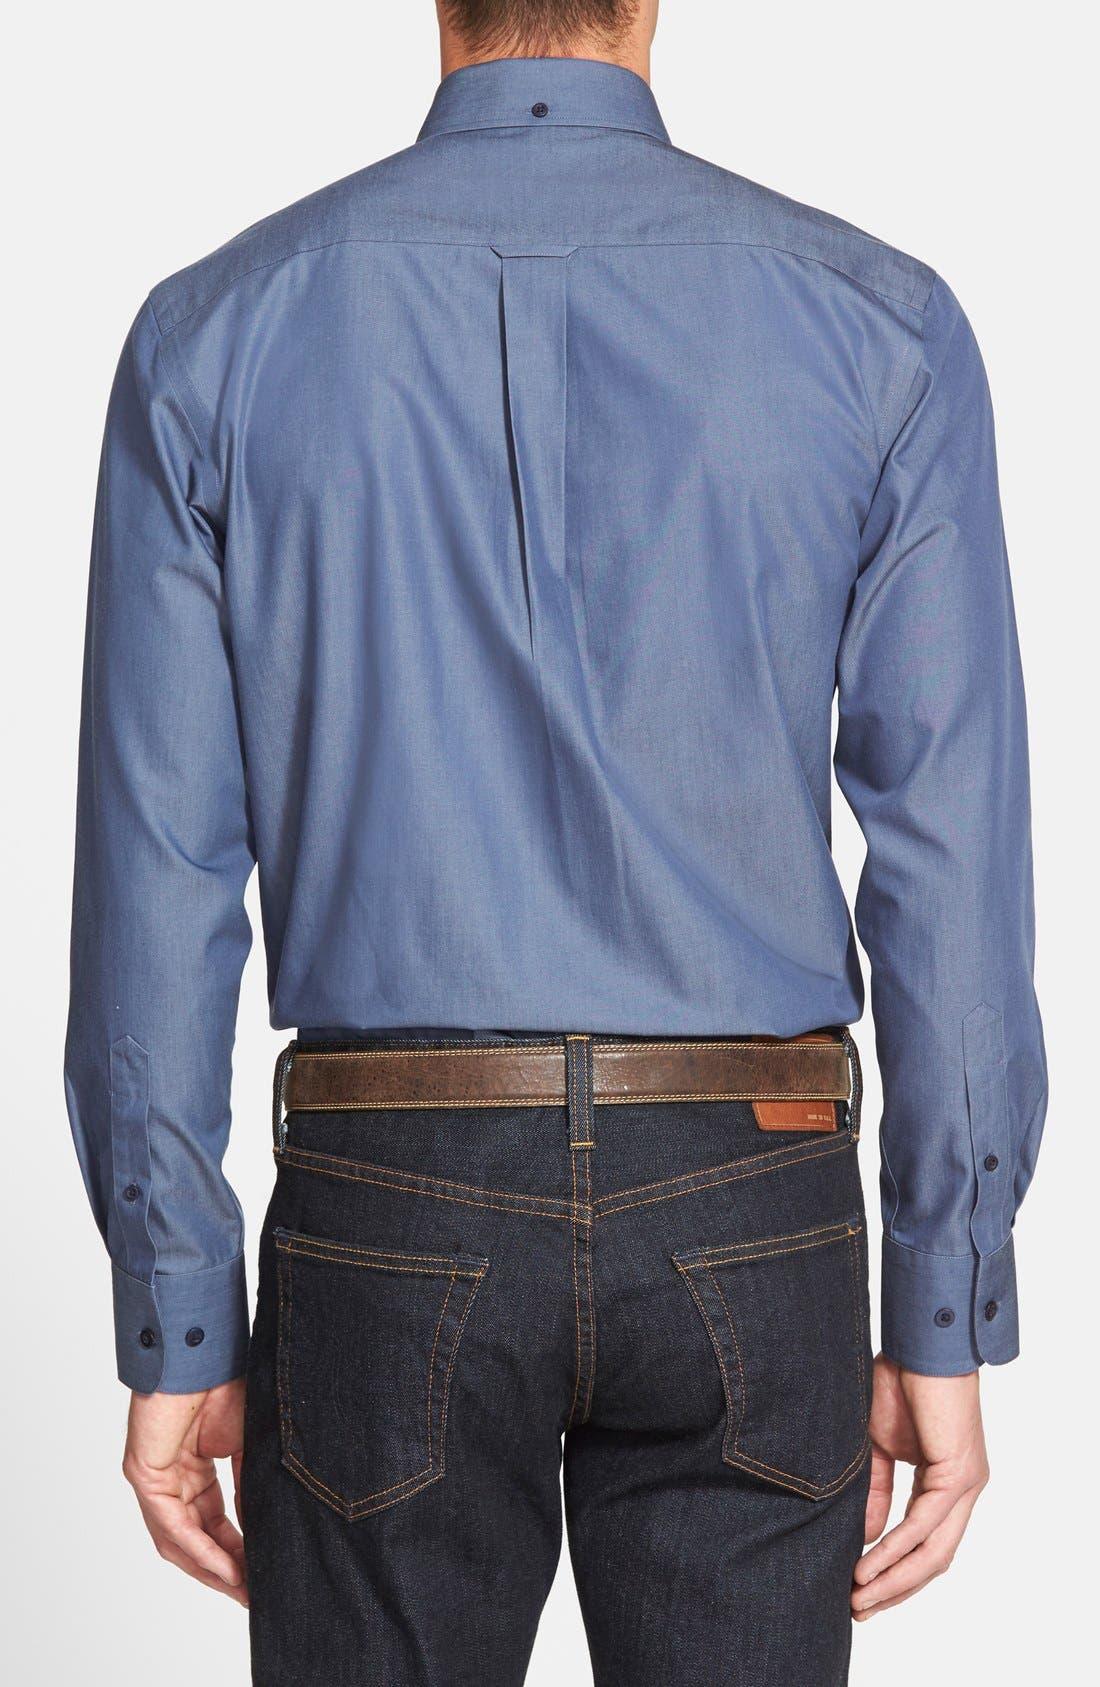 Alternate Image 2  - Nordstrom Men's Shop Smartcare™ Regular Fit Twill Denim Boat Shirt (Regular & Tall)